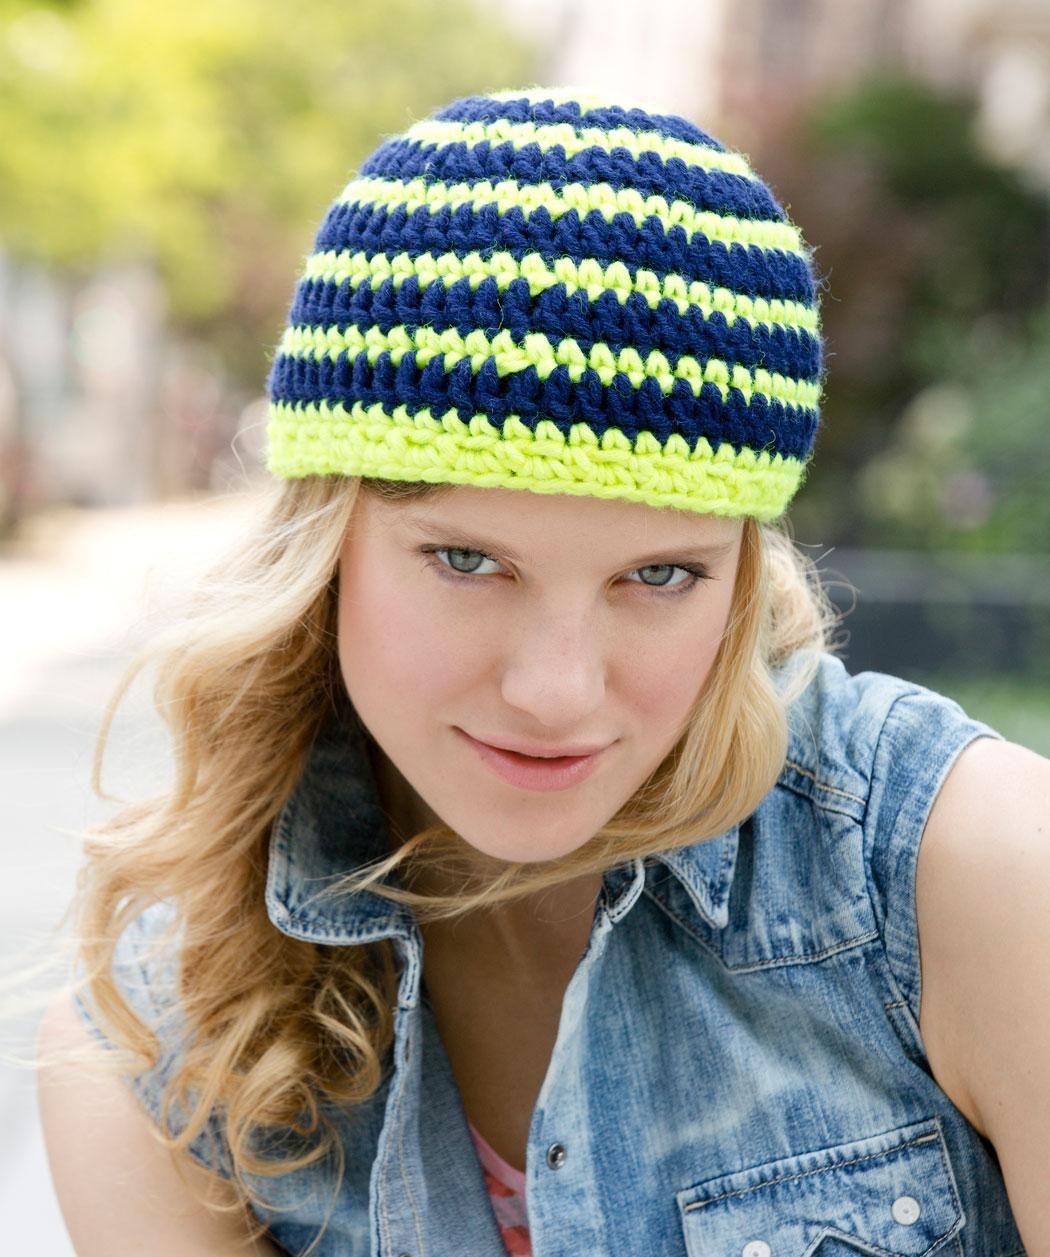 Striking Stripes Hat Free Crochet Pattern from Red Heart Yarns | New ...